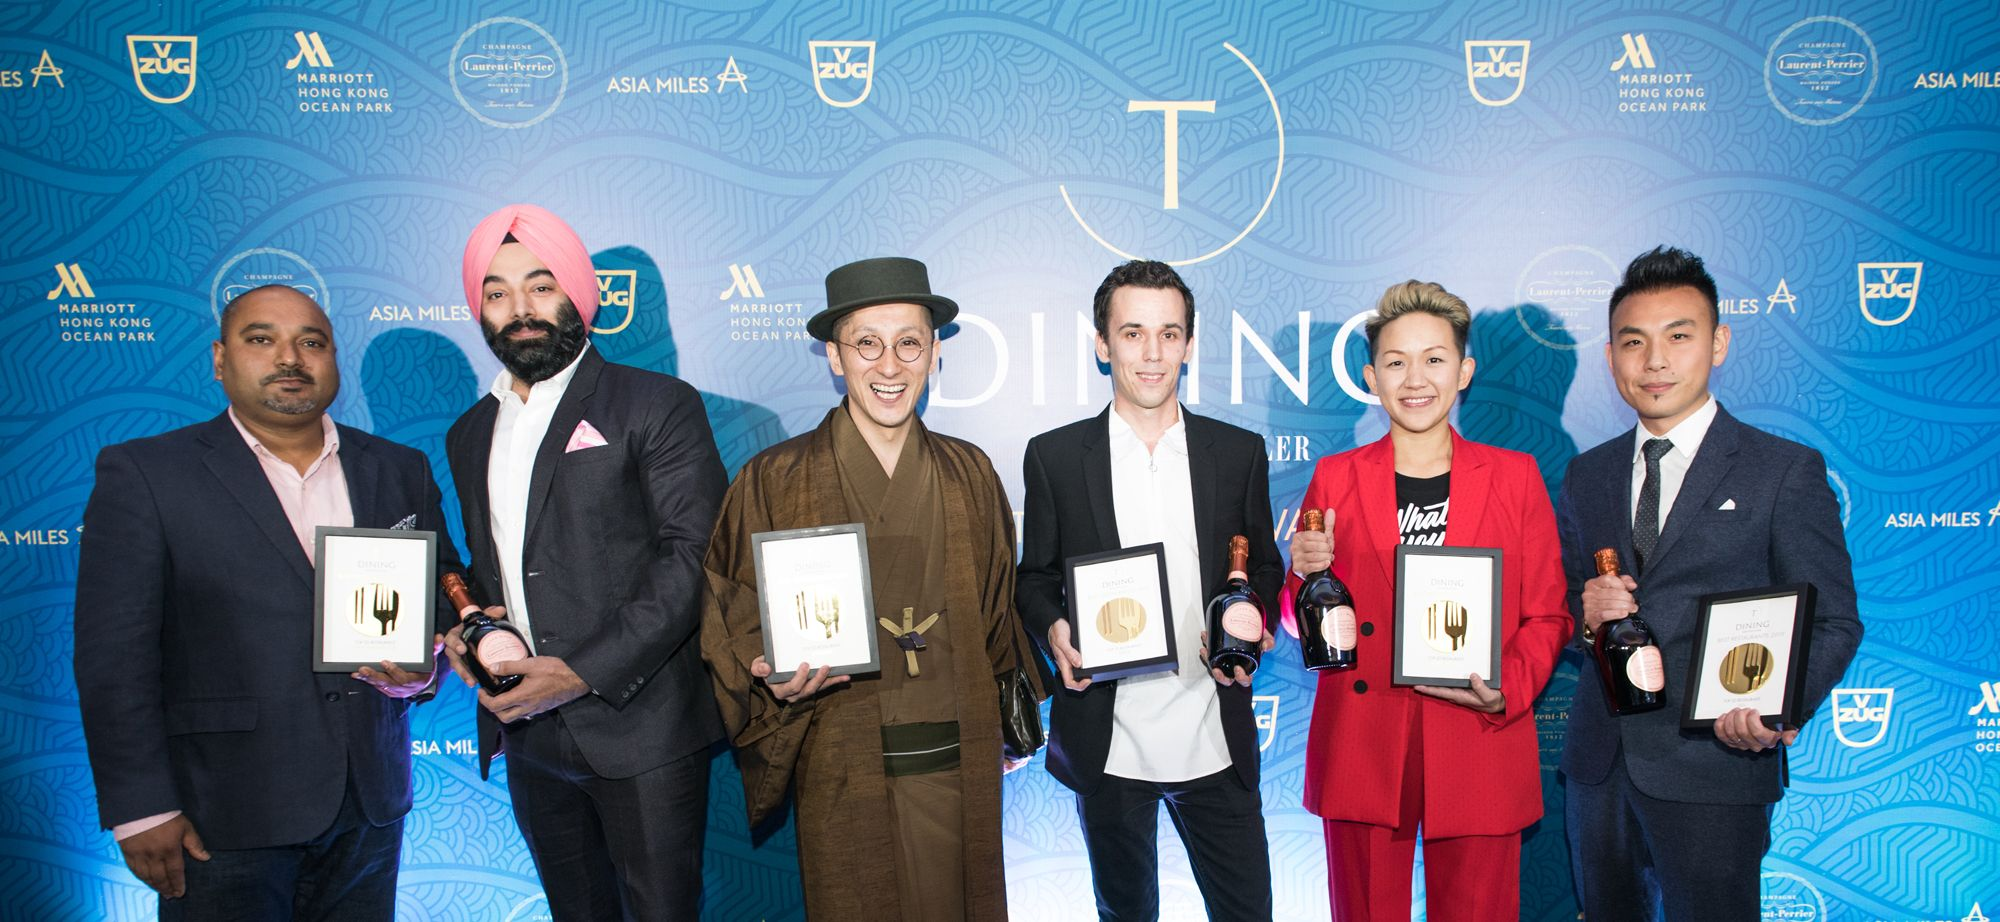 T.Dining Best Restaurants Awards 2019: Inside The Ballroom